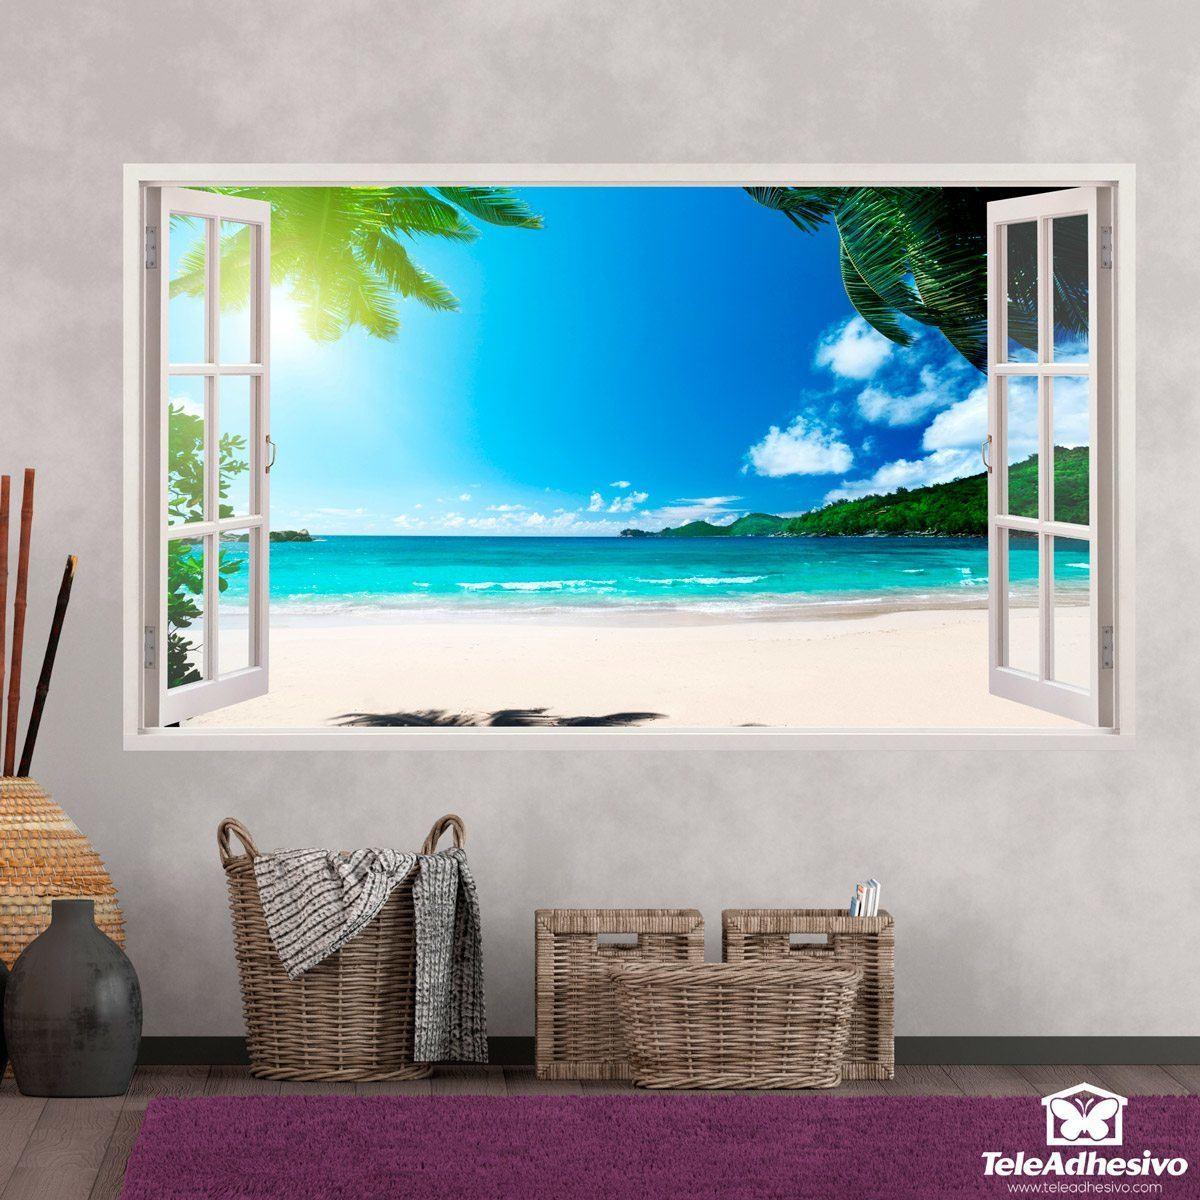 Compra vinilos decorativos de ventanas teleadhesivo for Vinilos pared paisajes